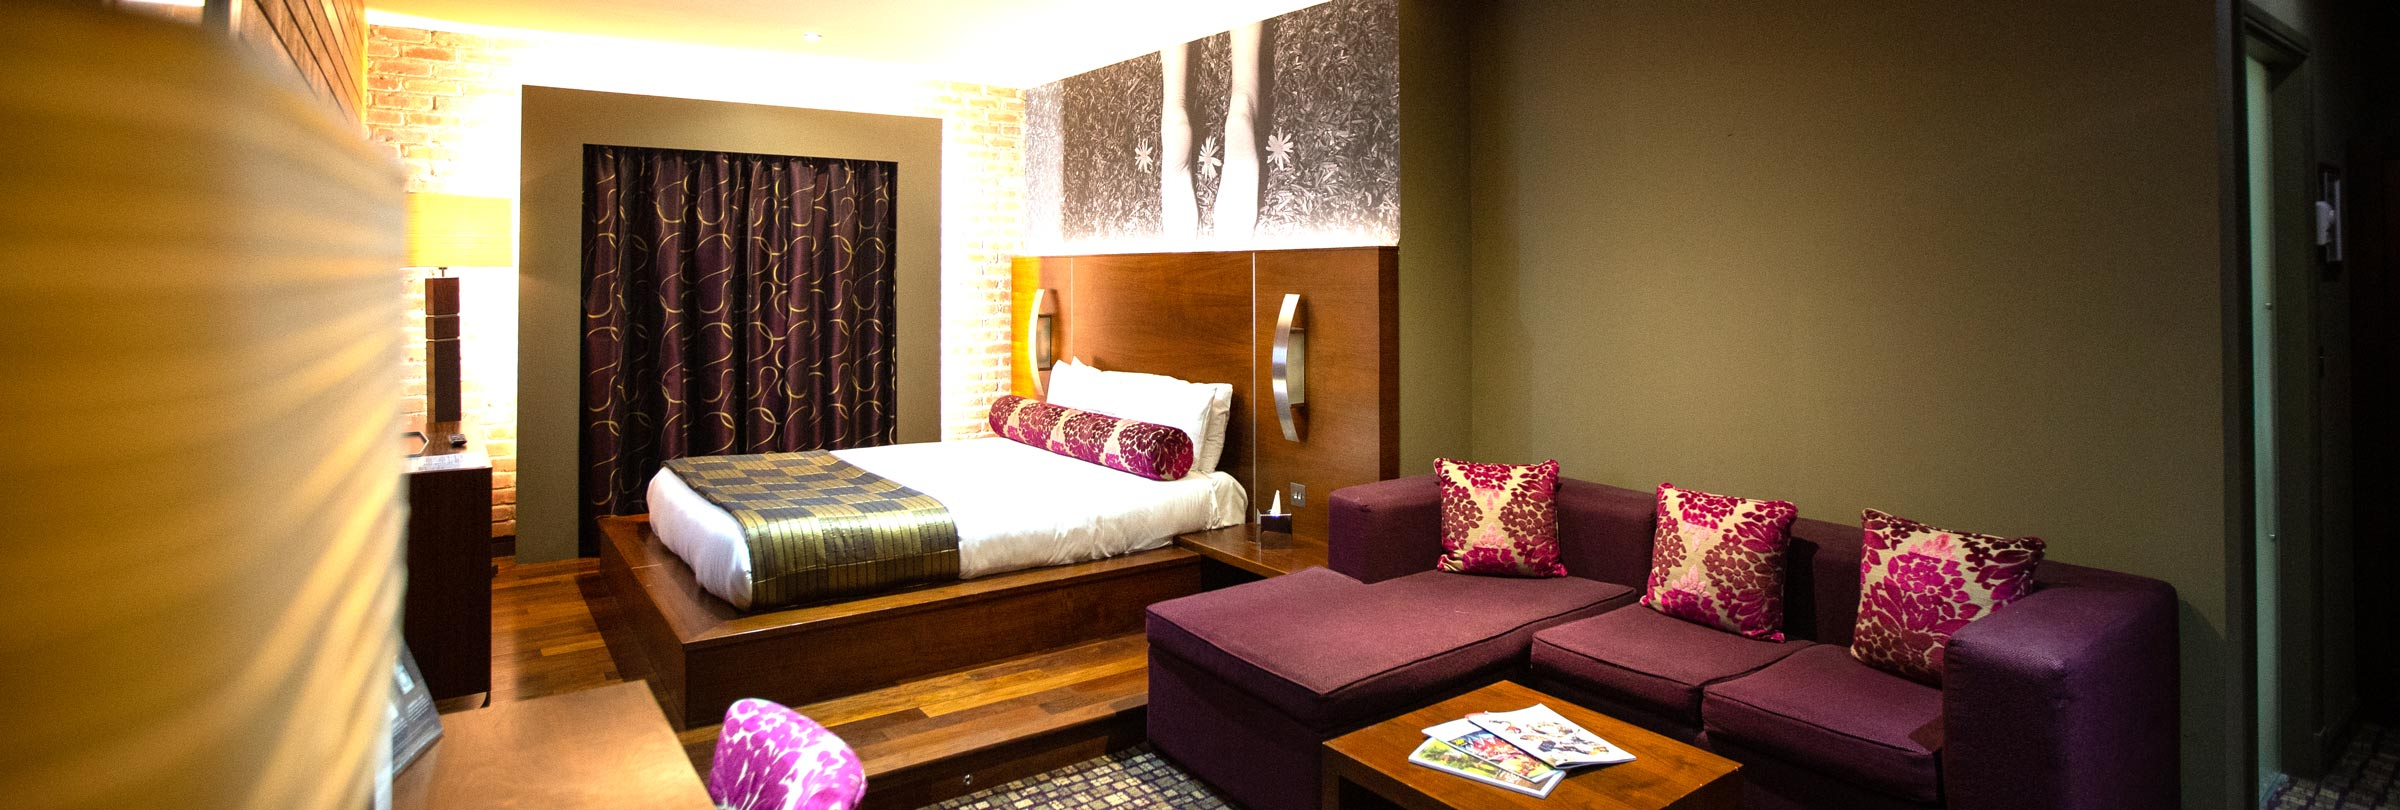 Wedding Hotel Accommodation 2